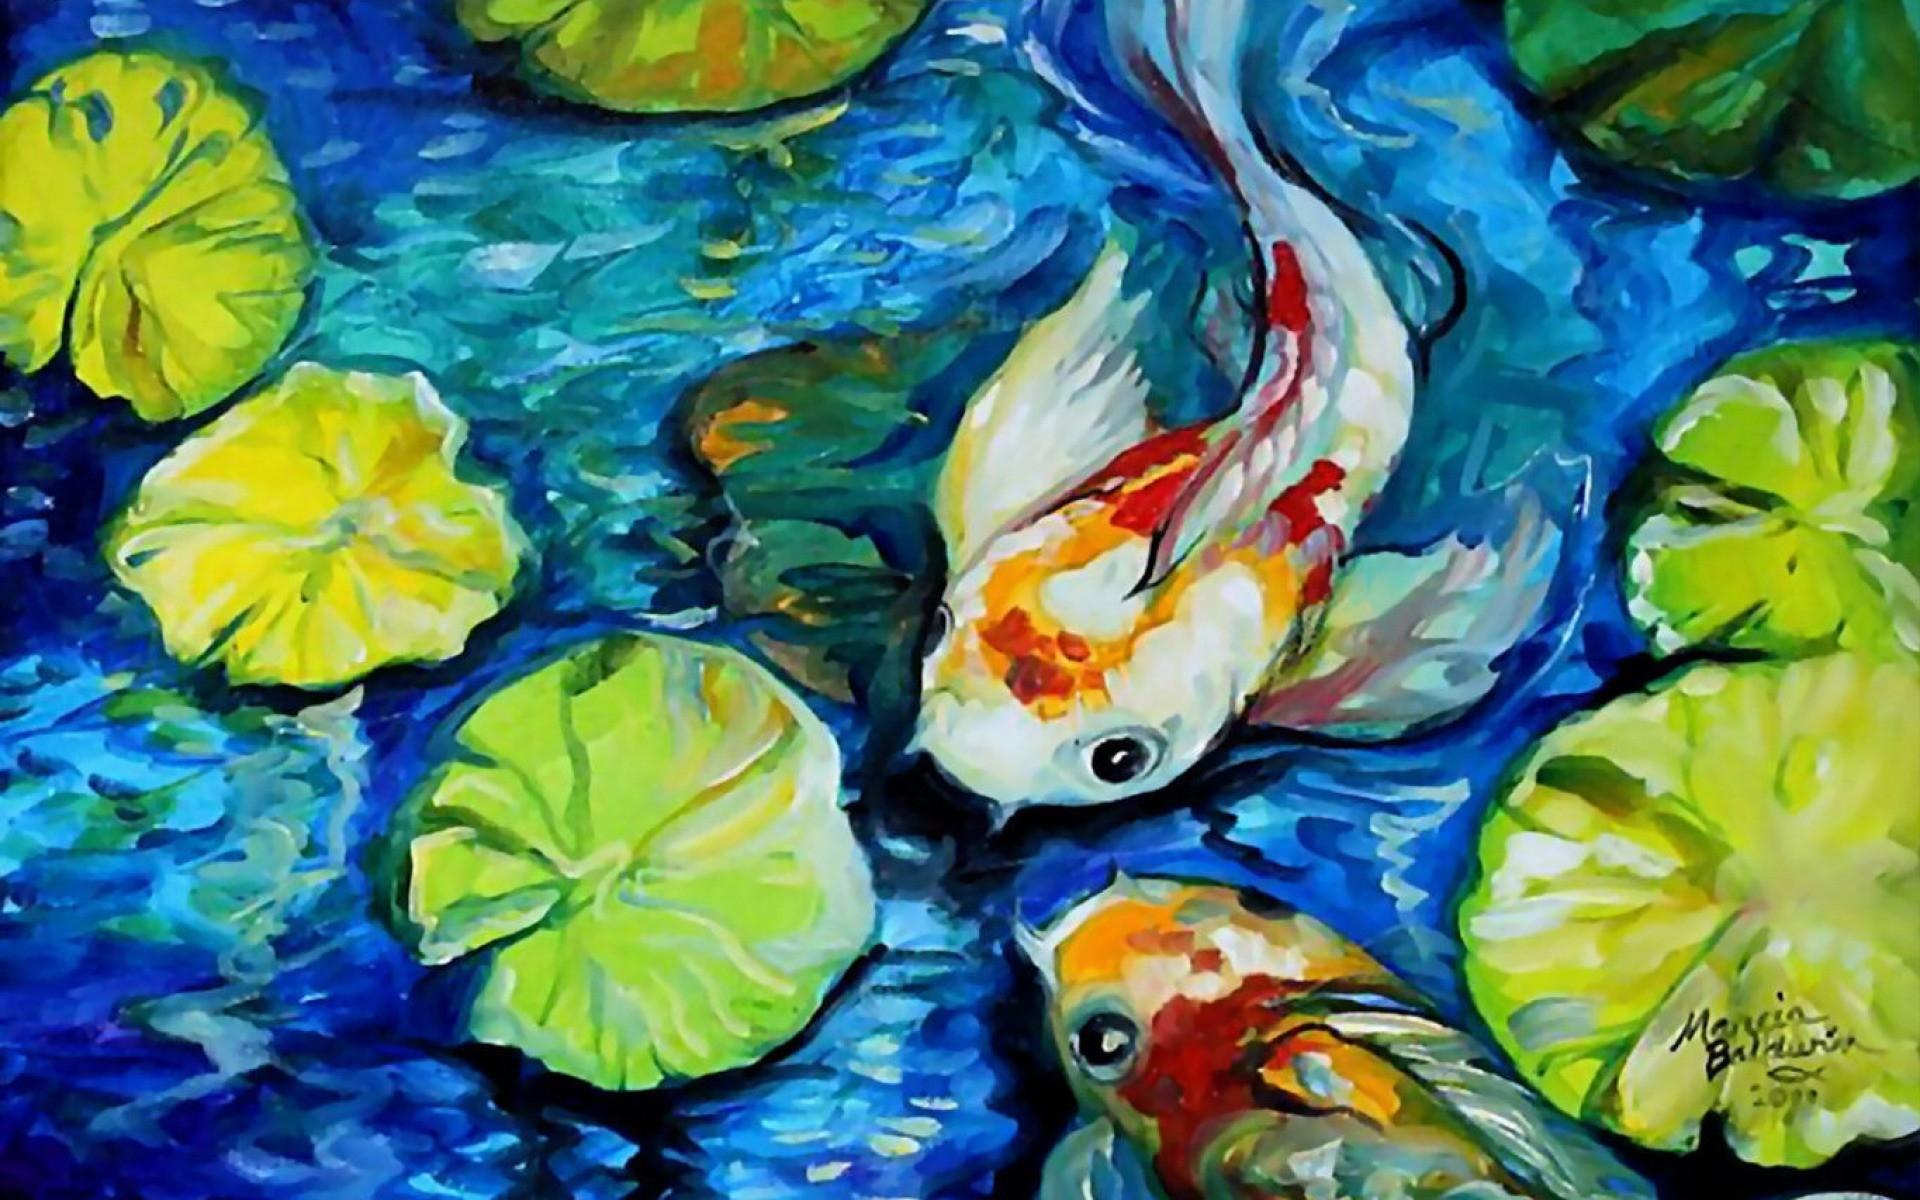 Koi fish wallpaper 59 images for Koi pond screensaver